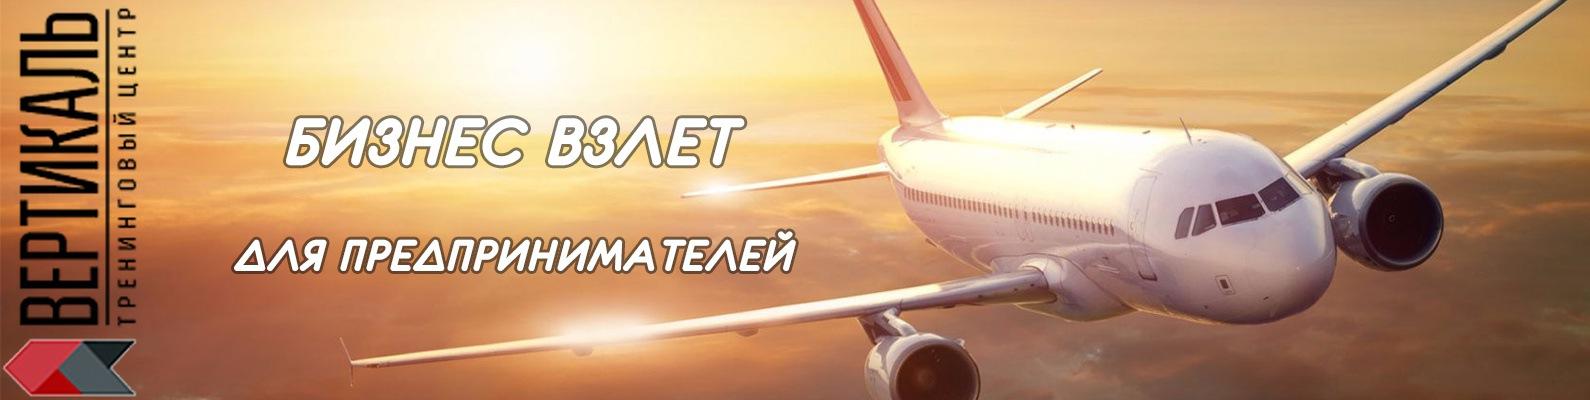 de europese luchtvaart industrie